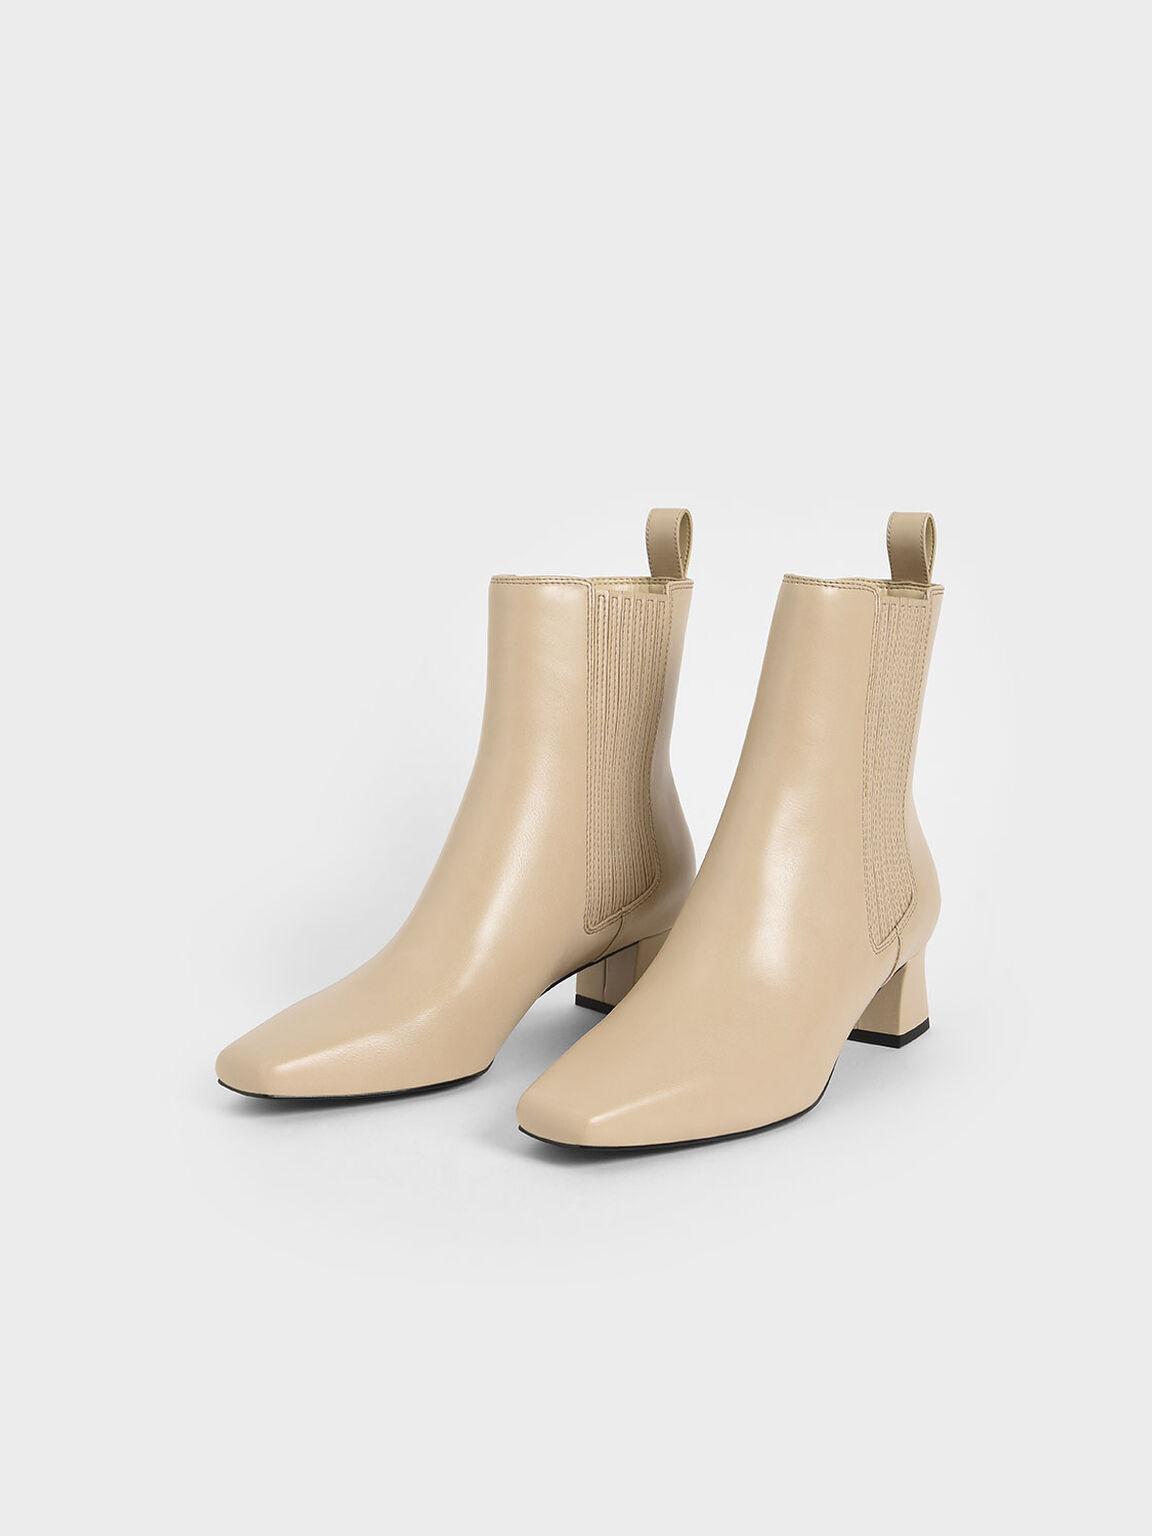 Stitch Trim Ankle Boots, Beige, hi-res